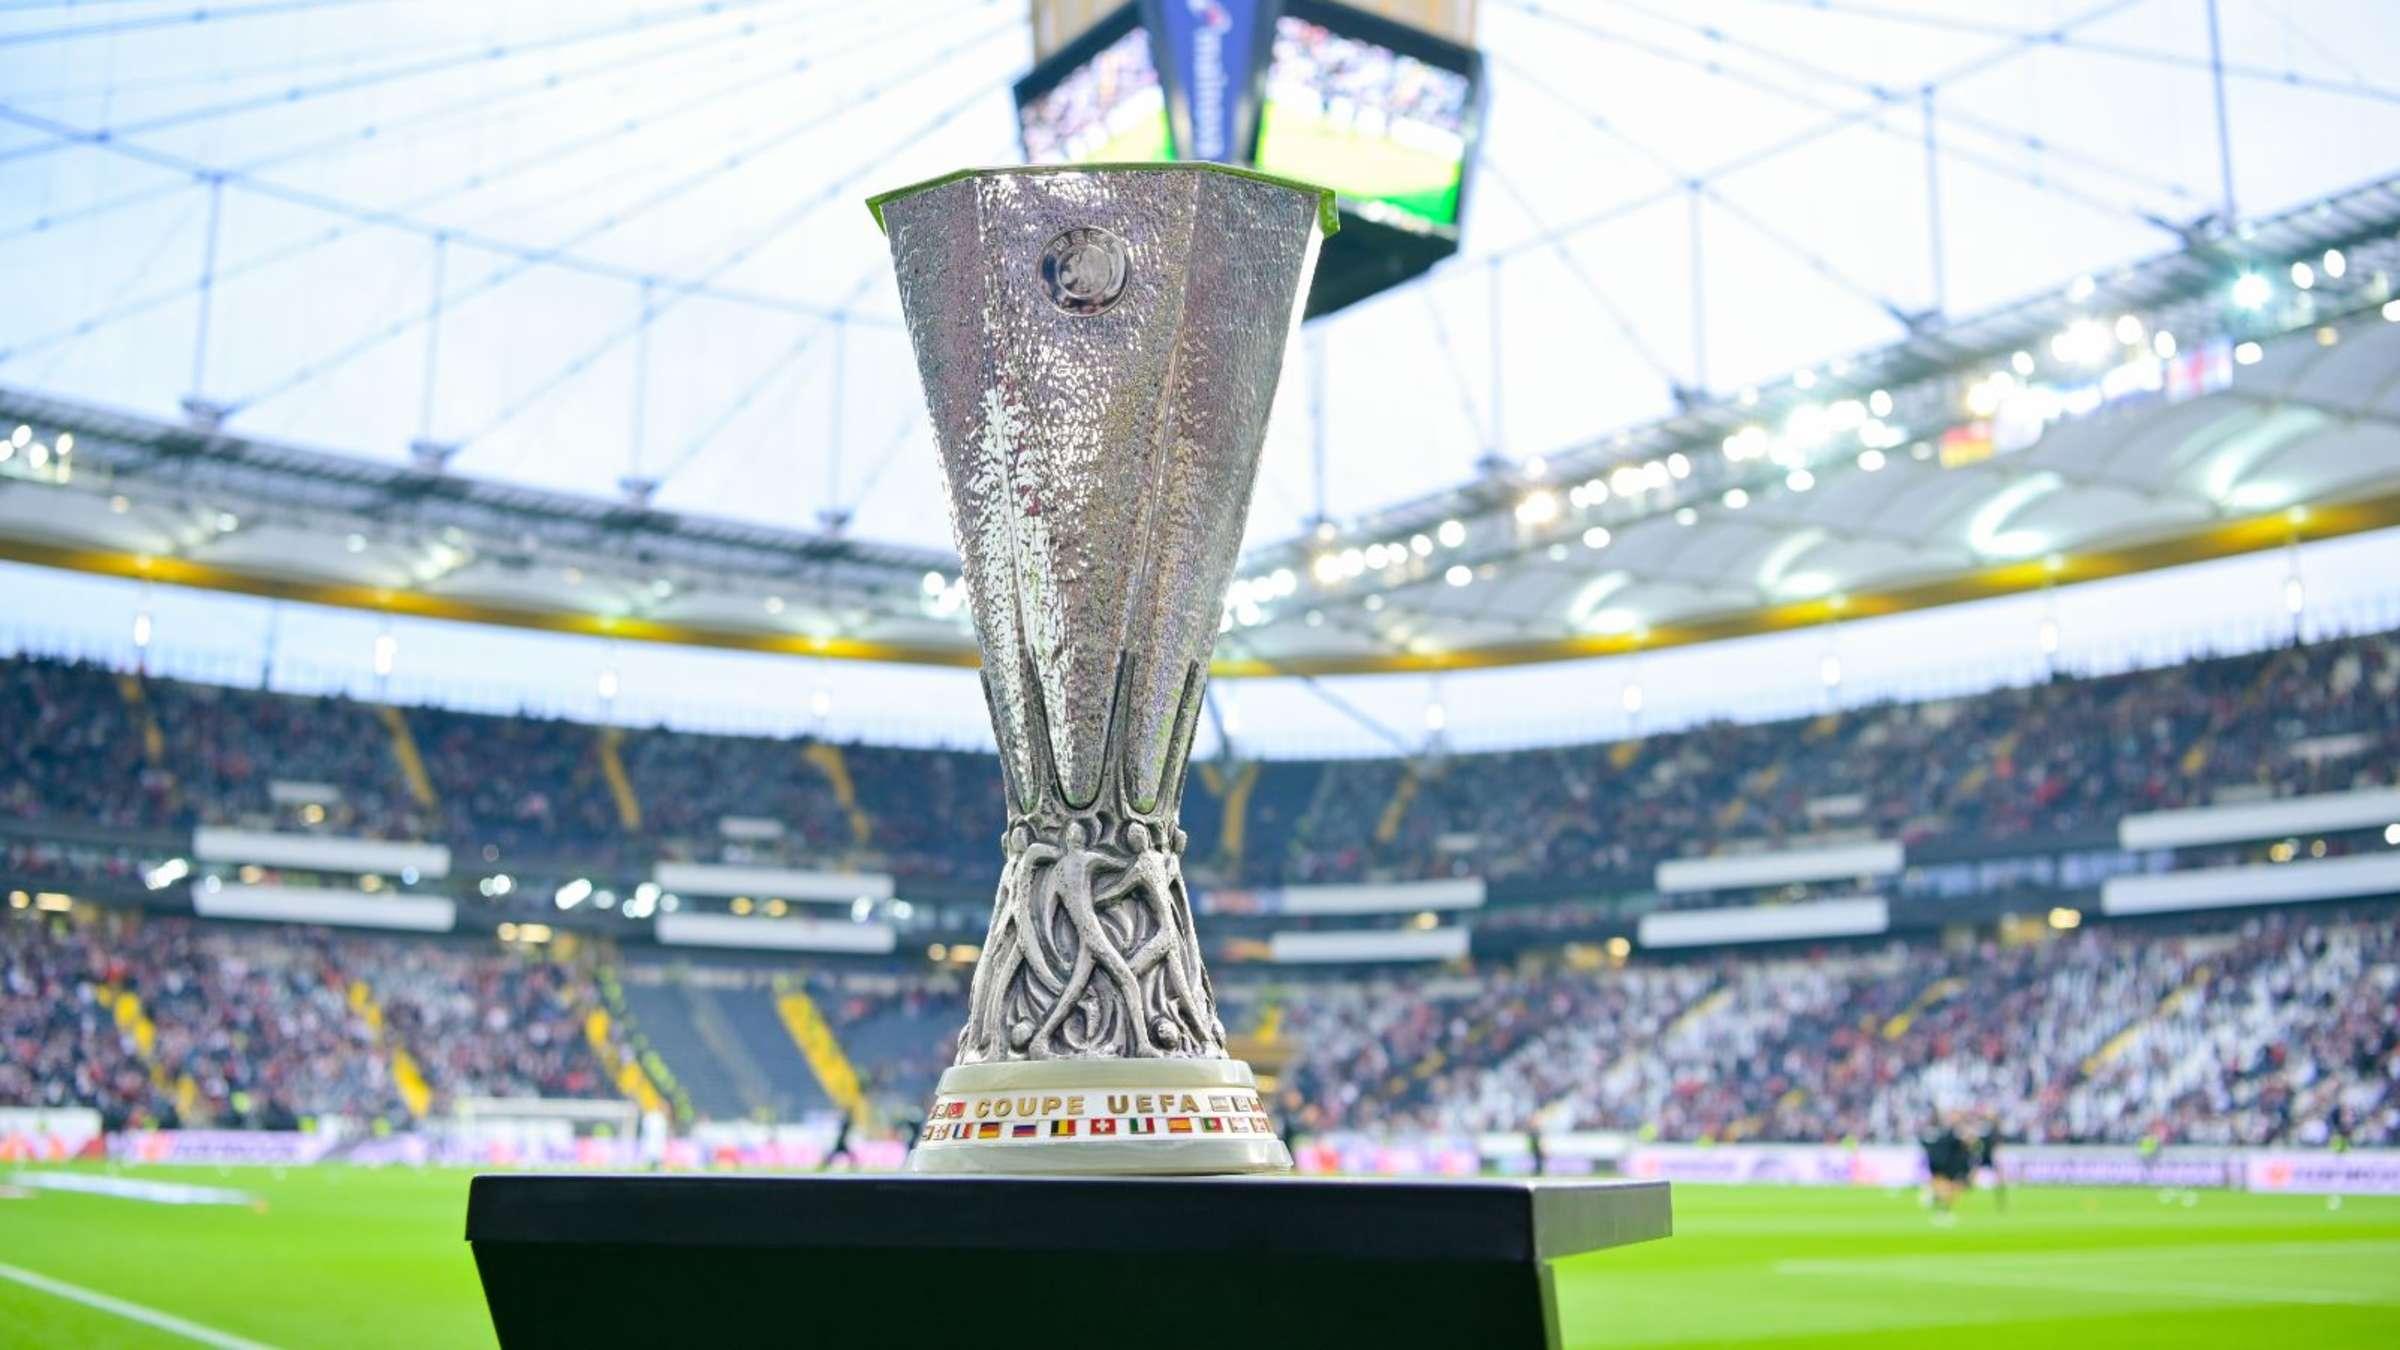 Spiel Frankfurt Heute